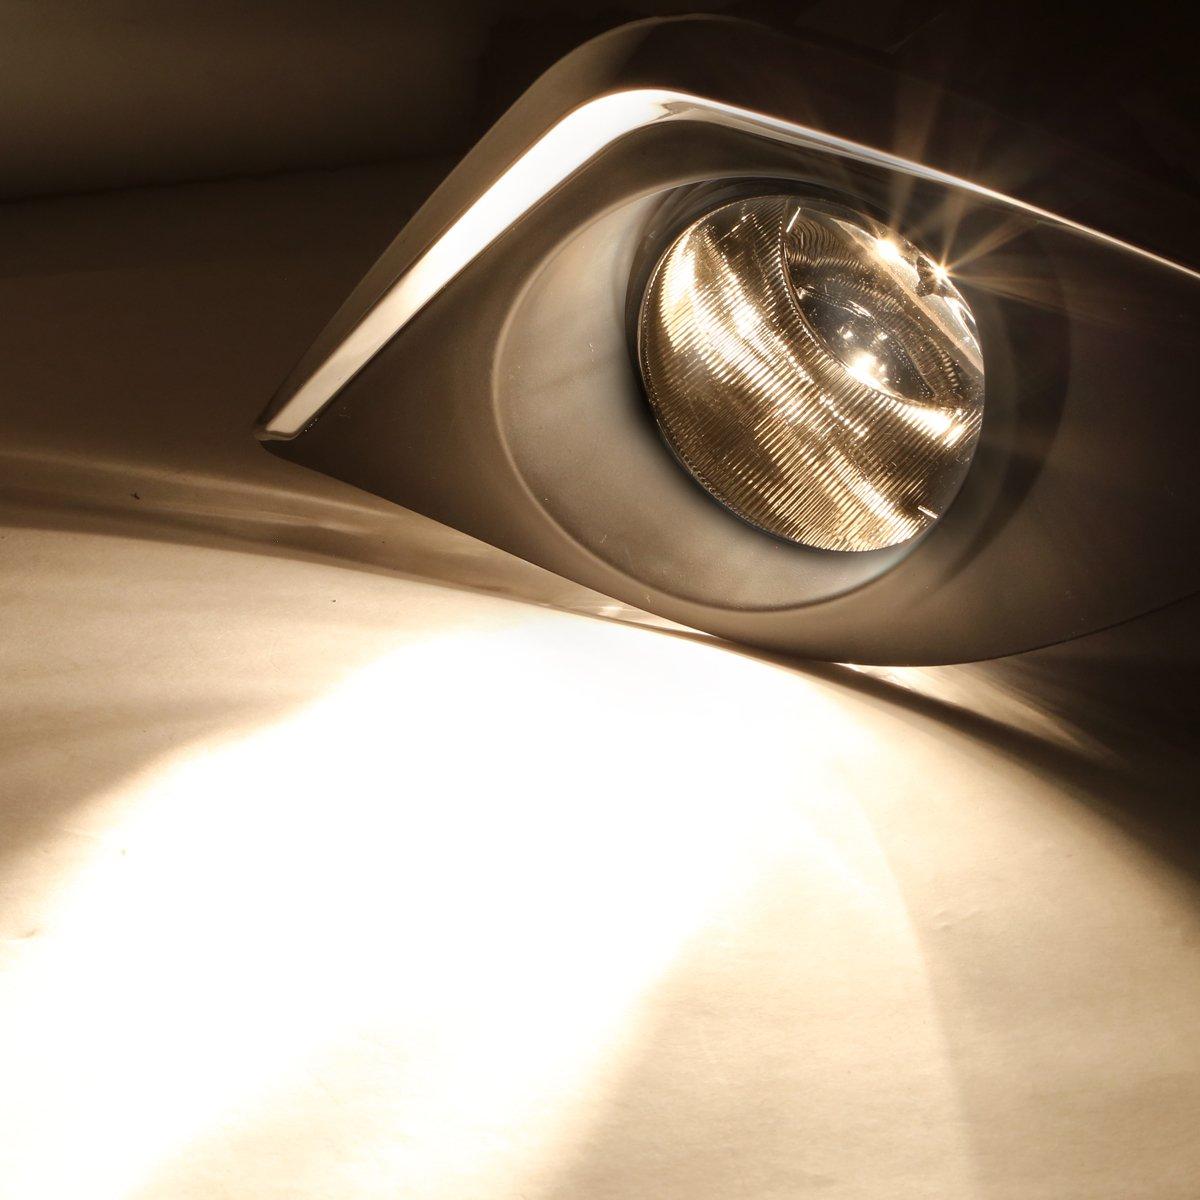 for 14-16 Corolla DNA MOTORING Clear FL-ZTL-170-CH Pair Fog Light w//Switch